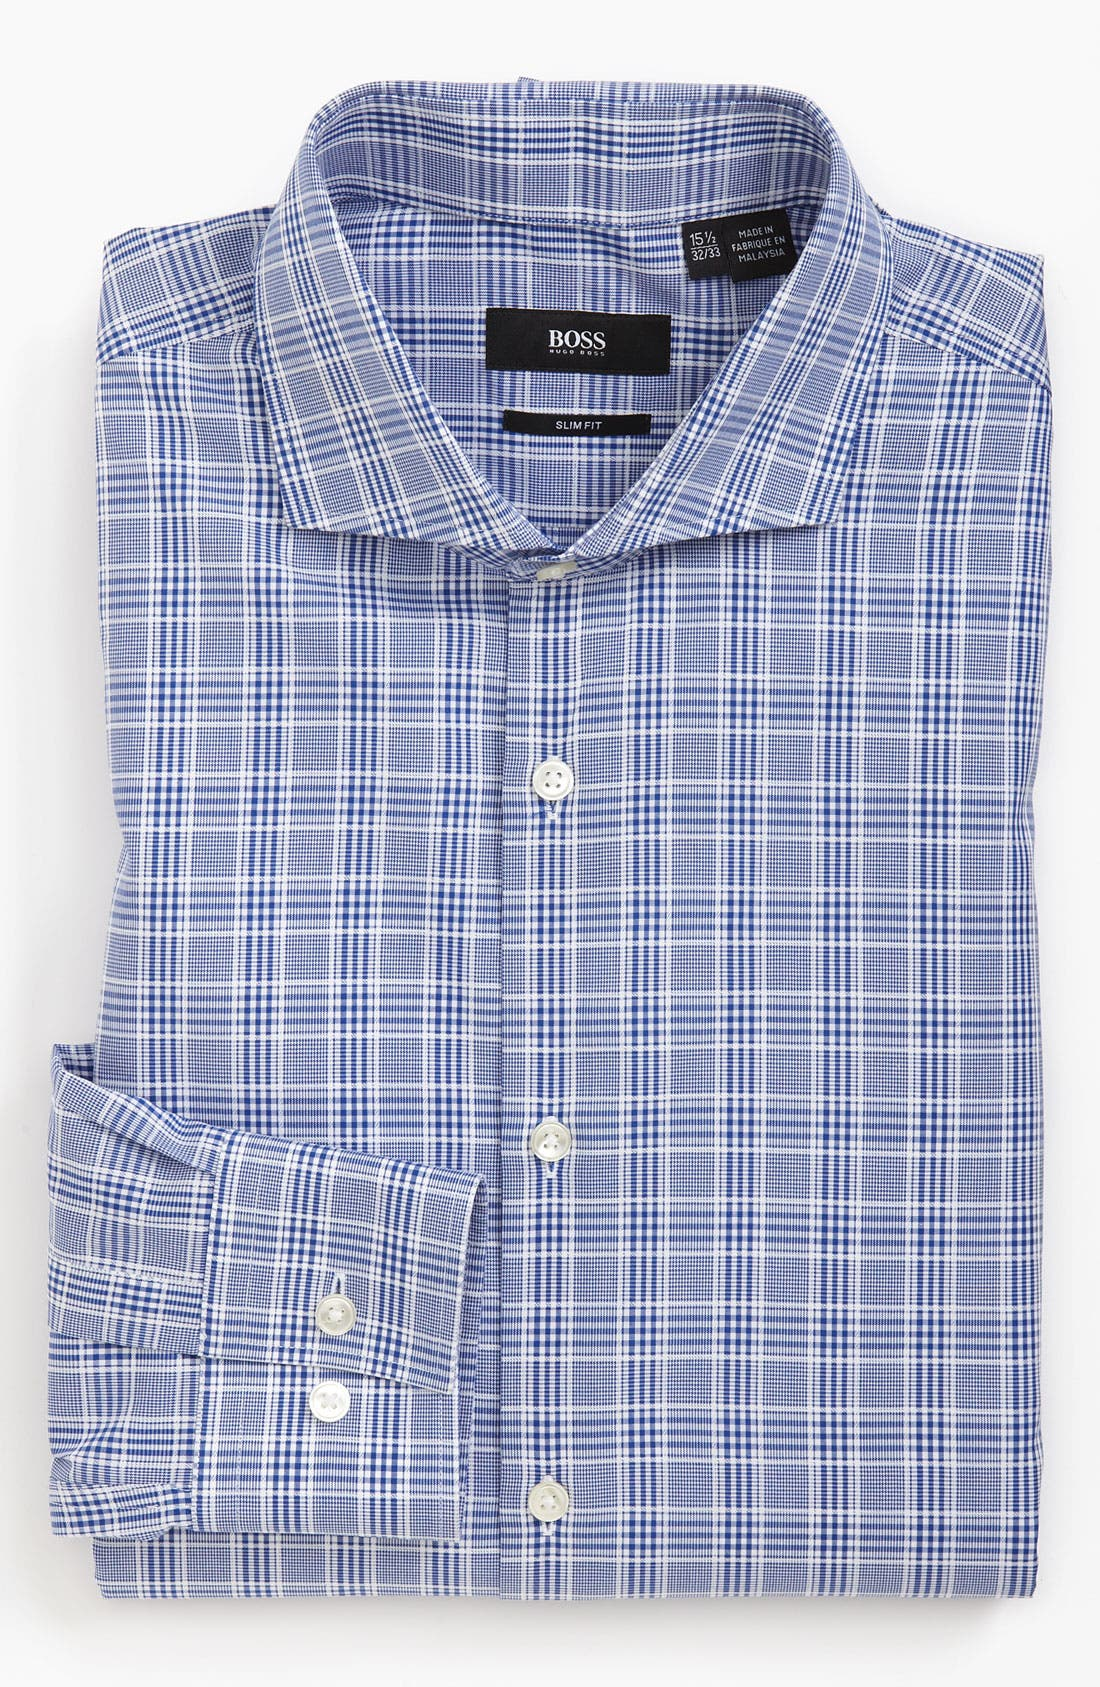 Black Slim Fit Dress Shirt,                         Main,                         color, Blue Plaid